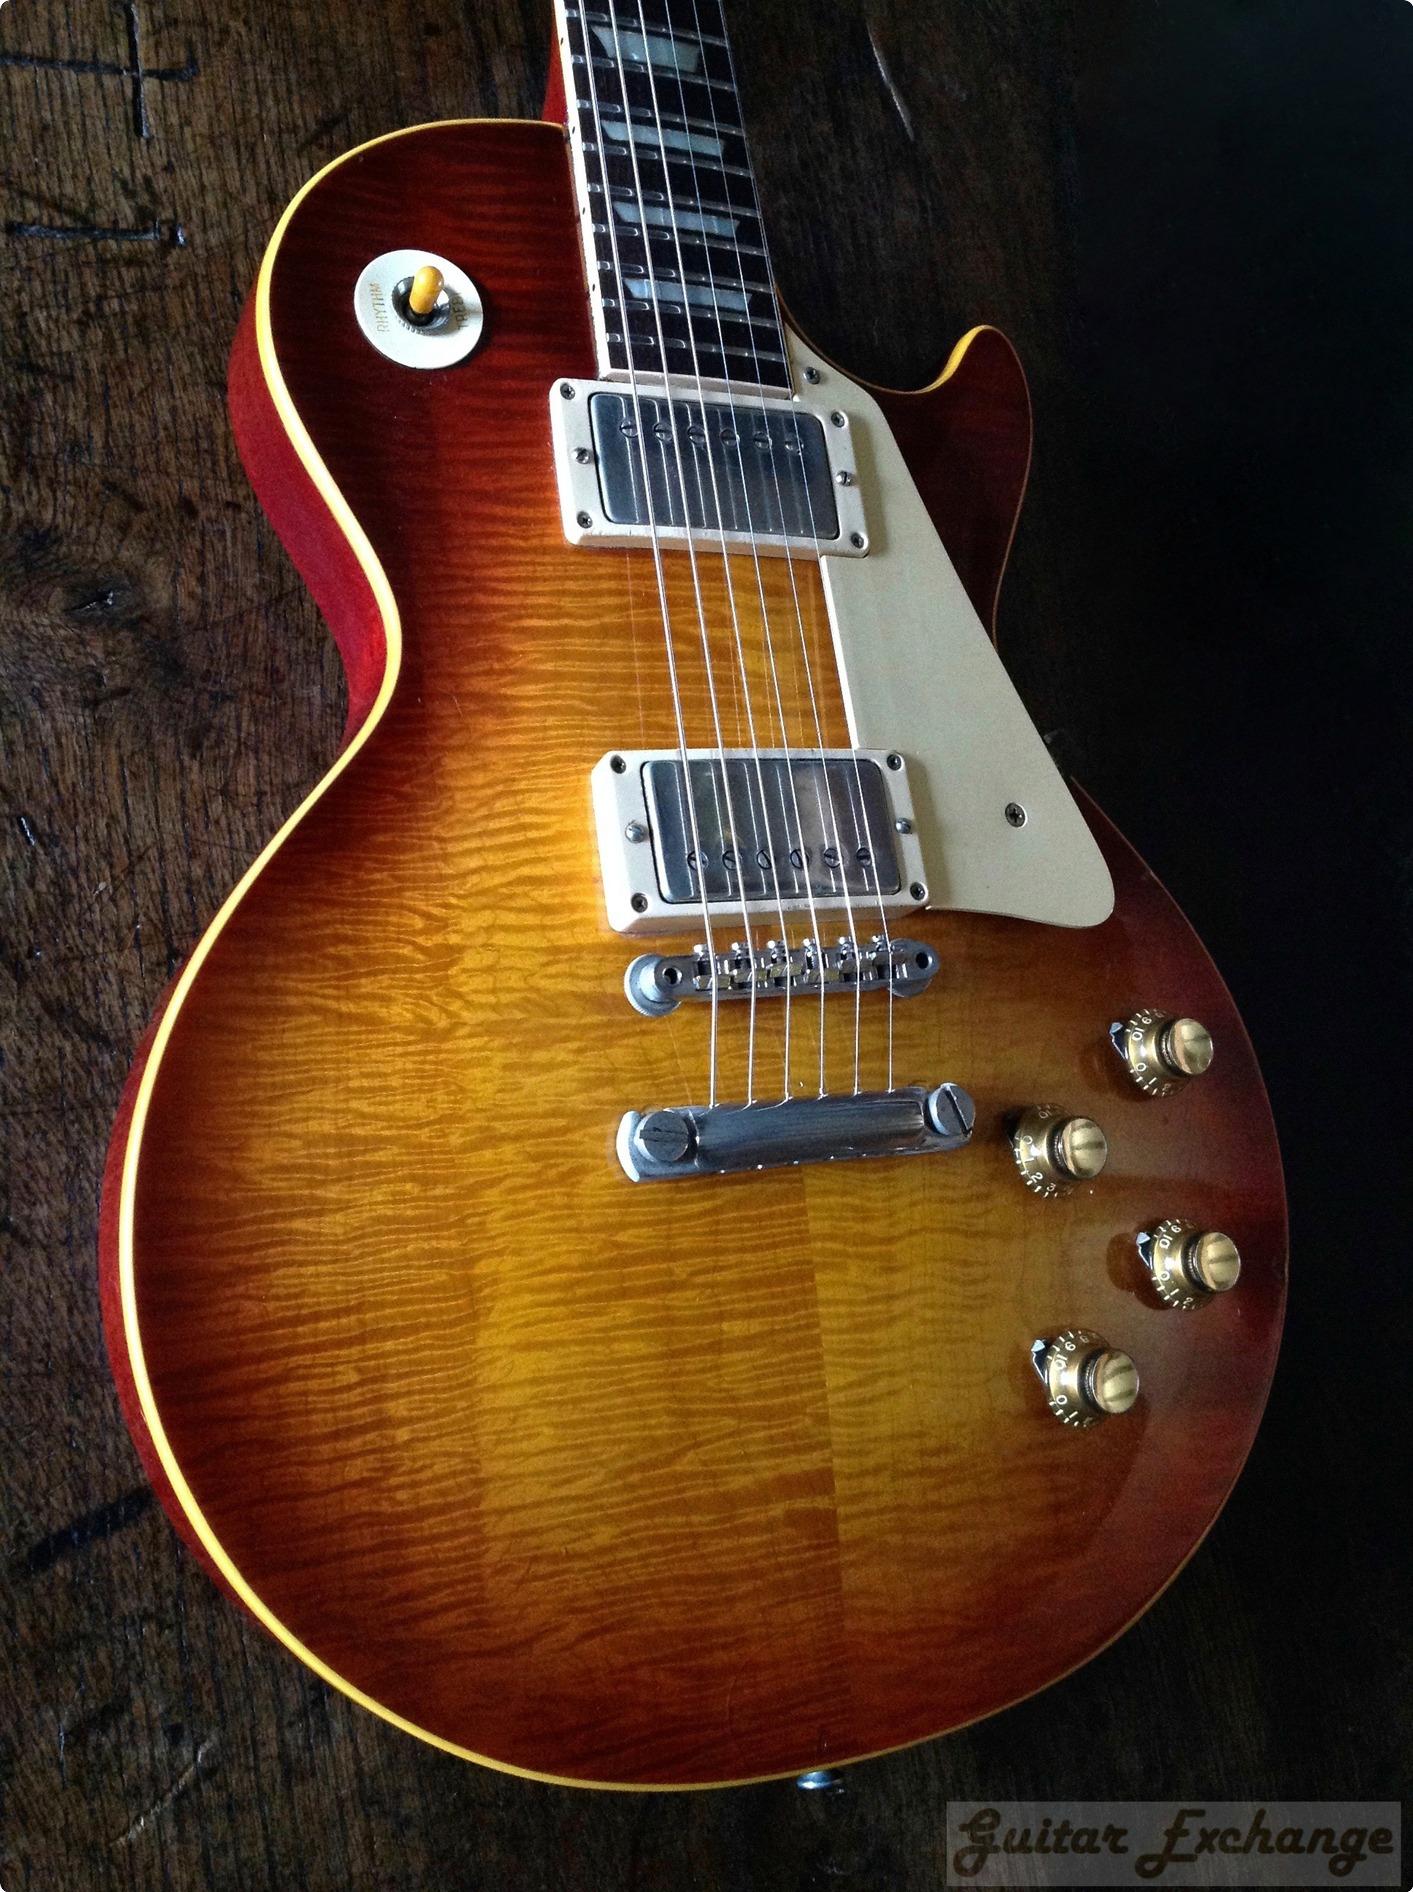 Gibson Les Paul Standard 1960 Guitar For Sale Guitar Exchange